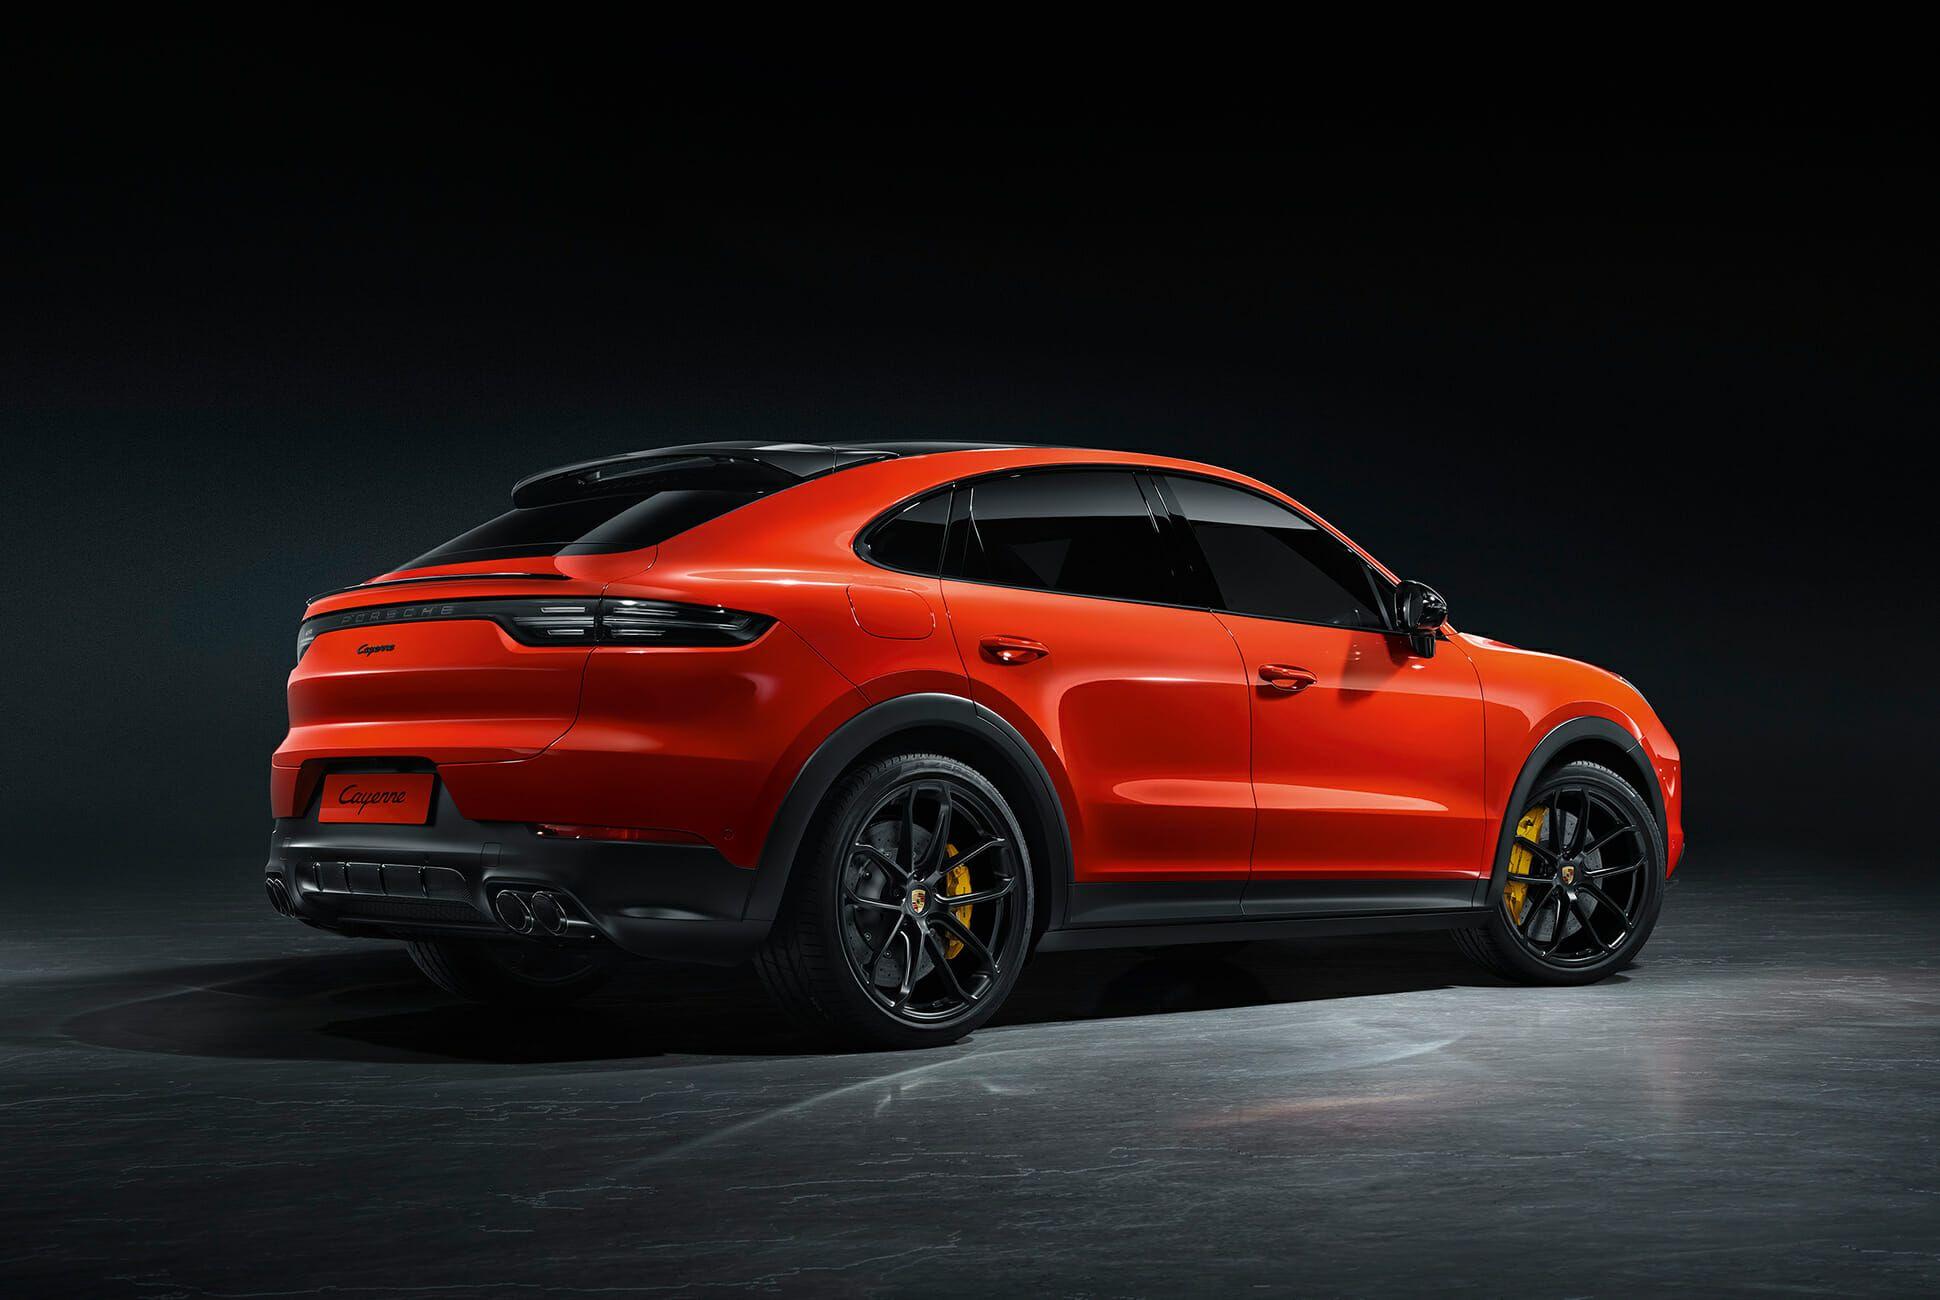 2020-Porsche-Cayenne-Coupe-gear-patrol-slide-4